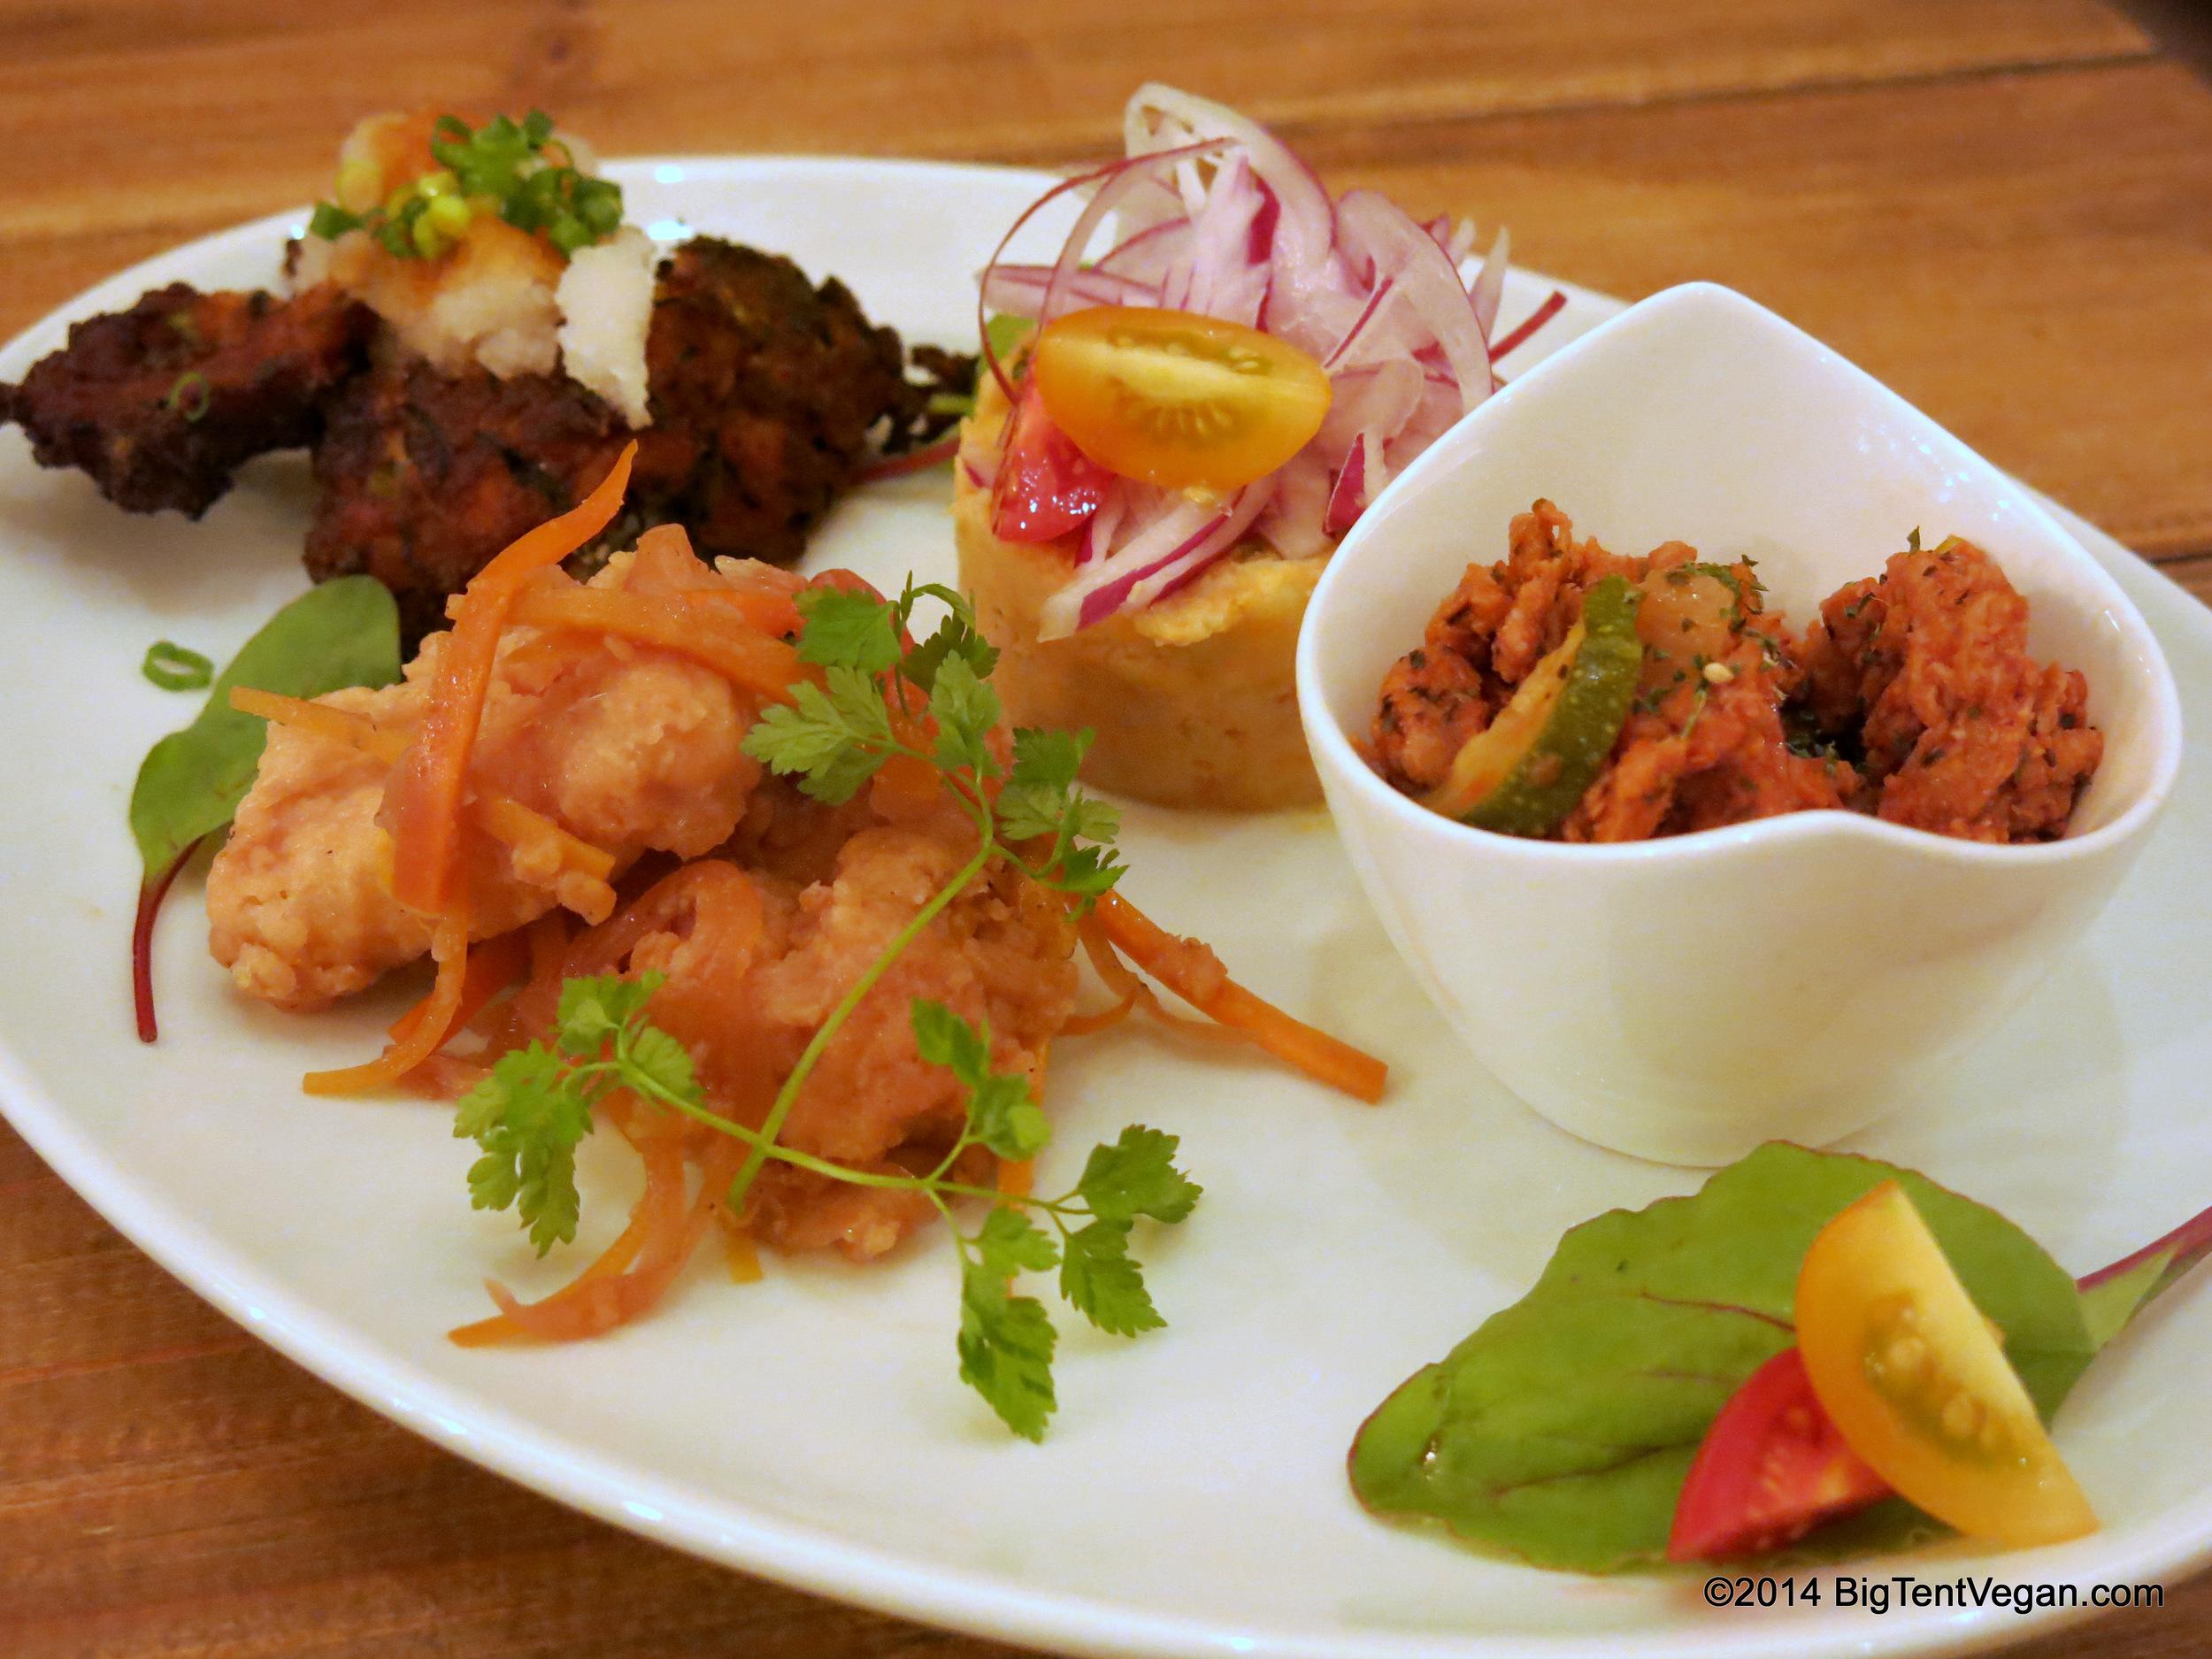 Chef's Appetizer Plate at 100% Vegan Restaurant Paprika Shokudo (Osaka, Japan)